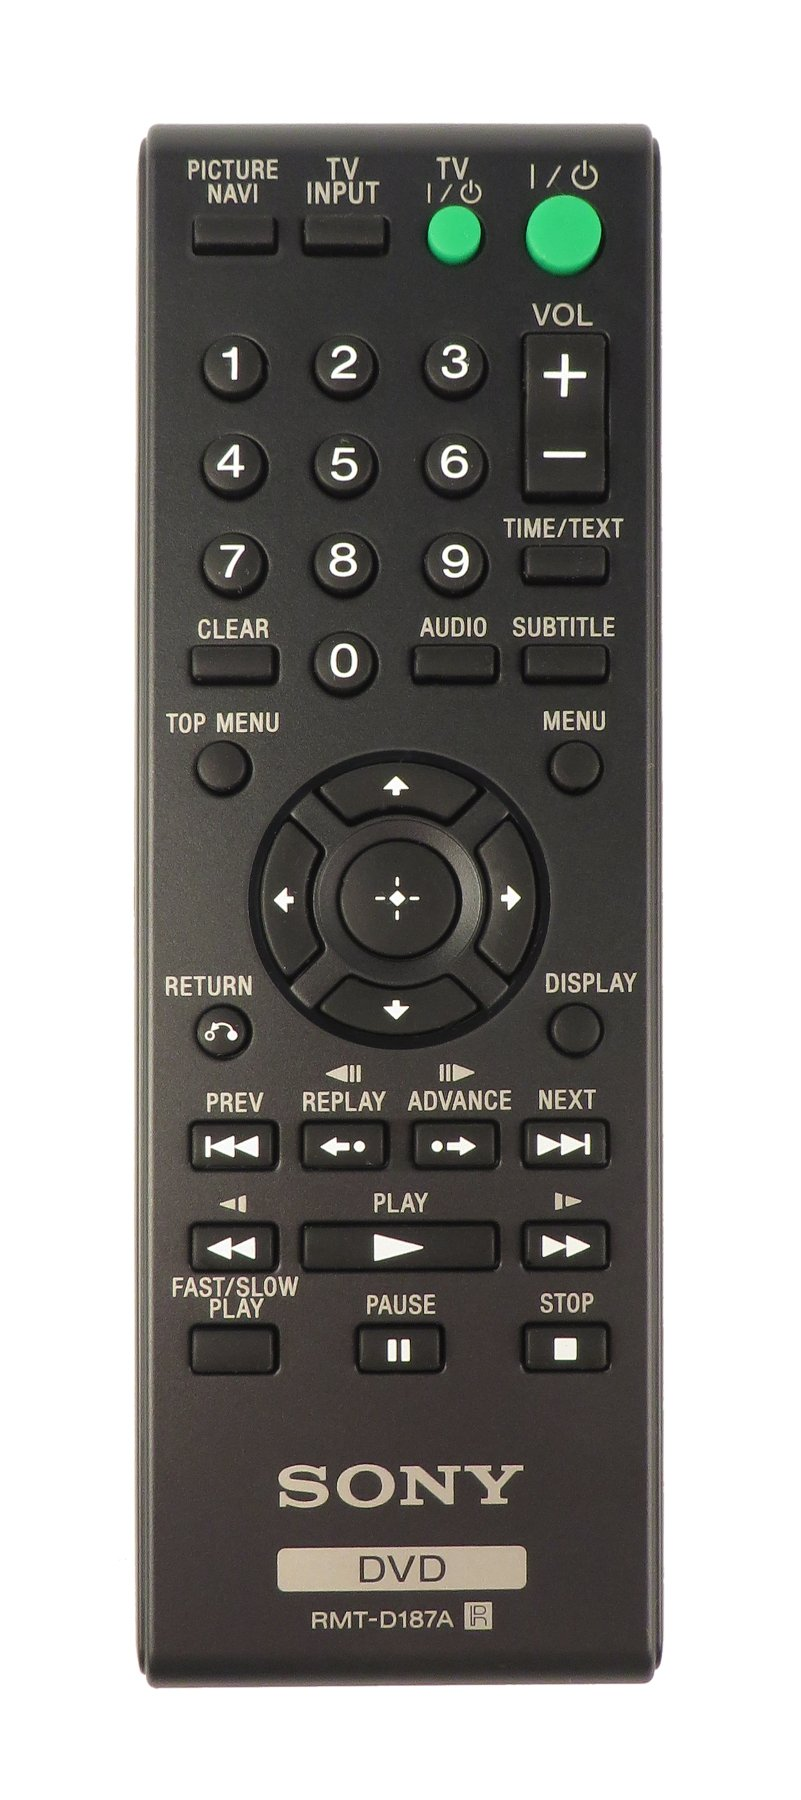 RMTD187A Remote for DVPSR200P, DVPCX985V, DVPCX777ES, DVPNS611HP